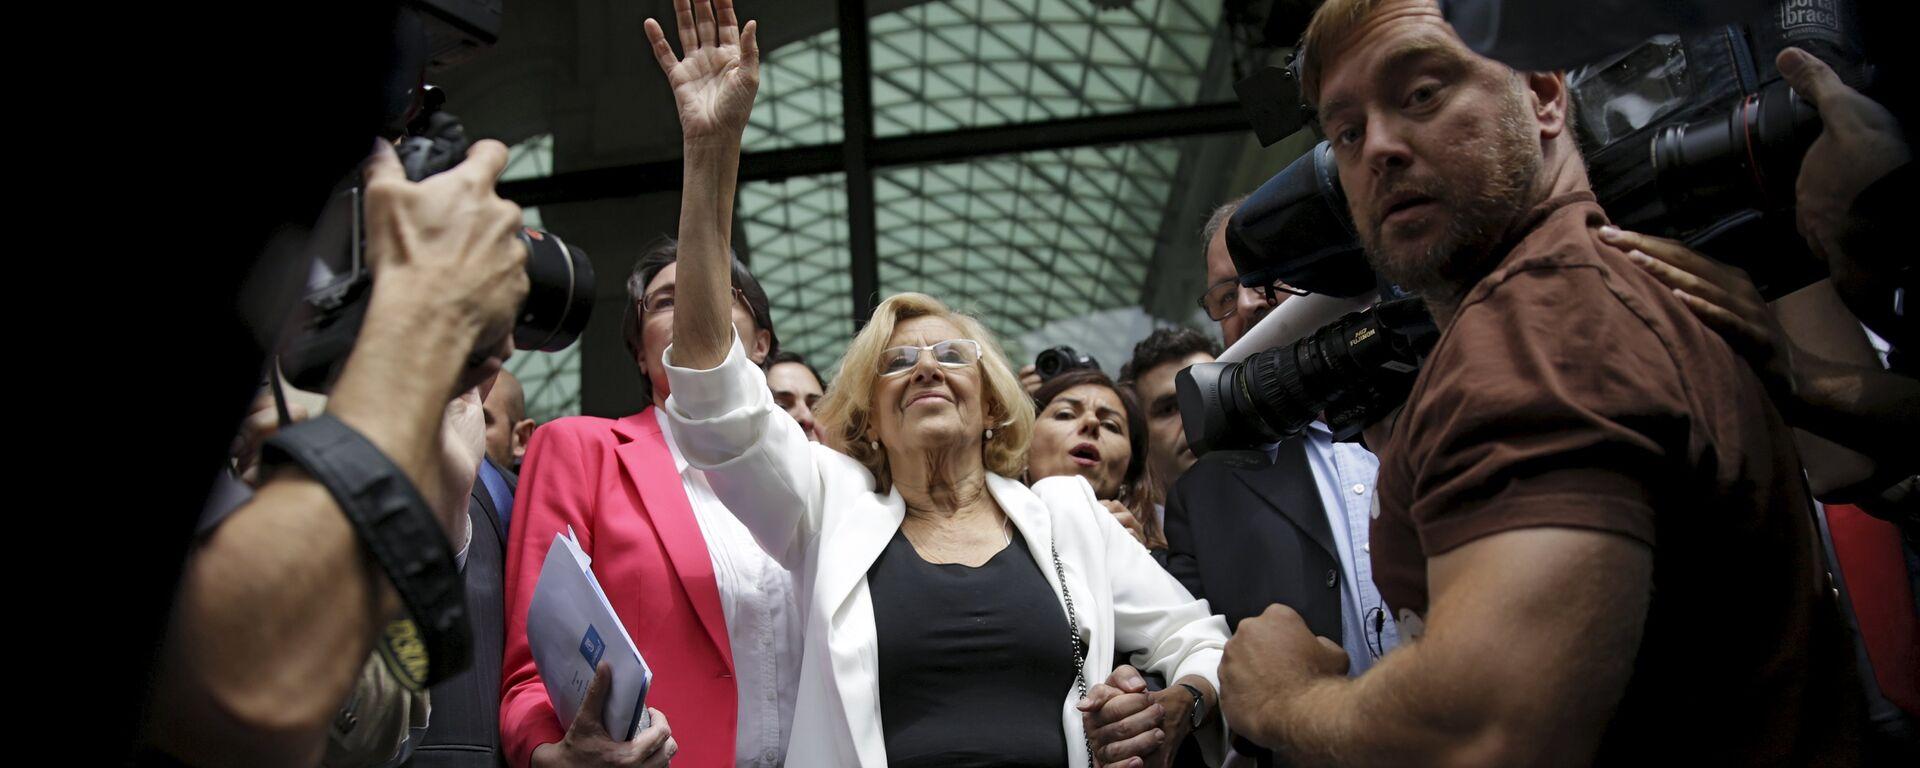 Manuela Carmena, alcaldesa de Madrid - Sputnik Mundo, 1920, 13.06.2015